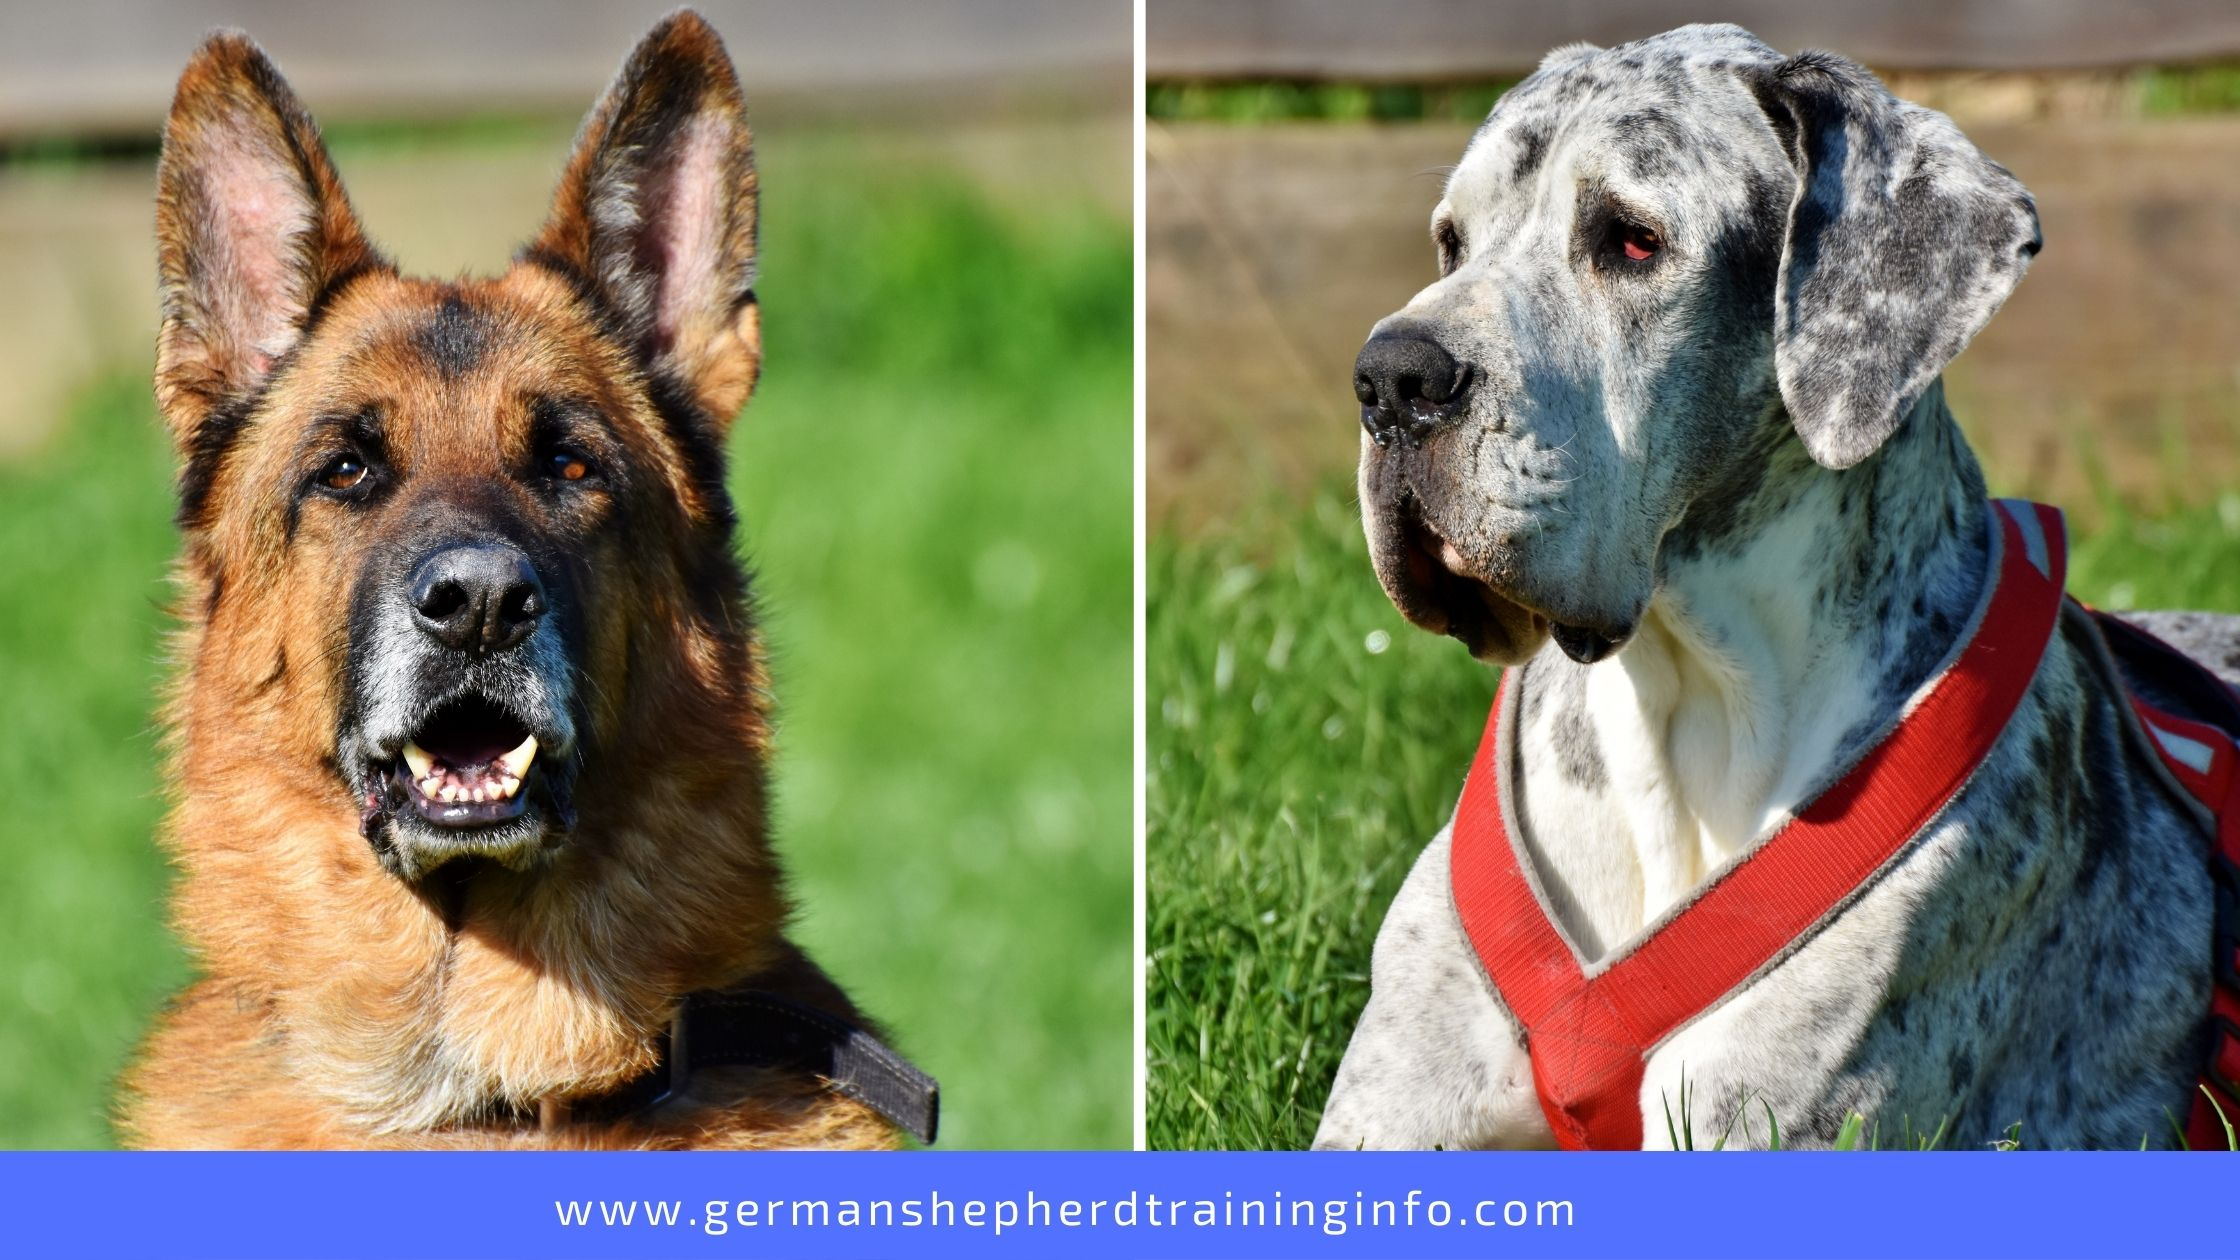 German shepherd vs. Great Dane: Size, Coat, Energy and Health Comparison